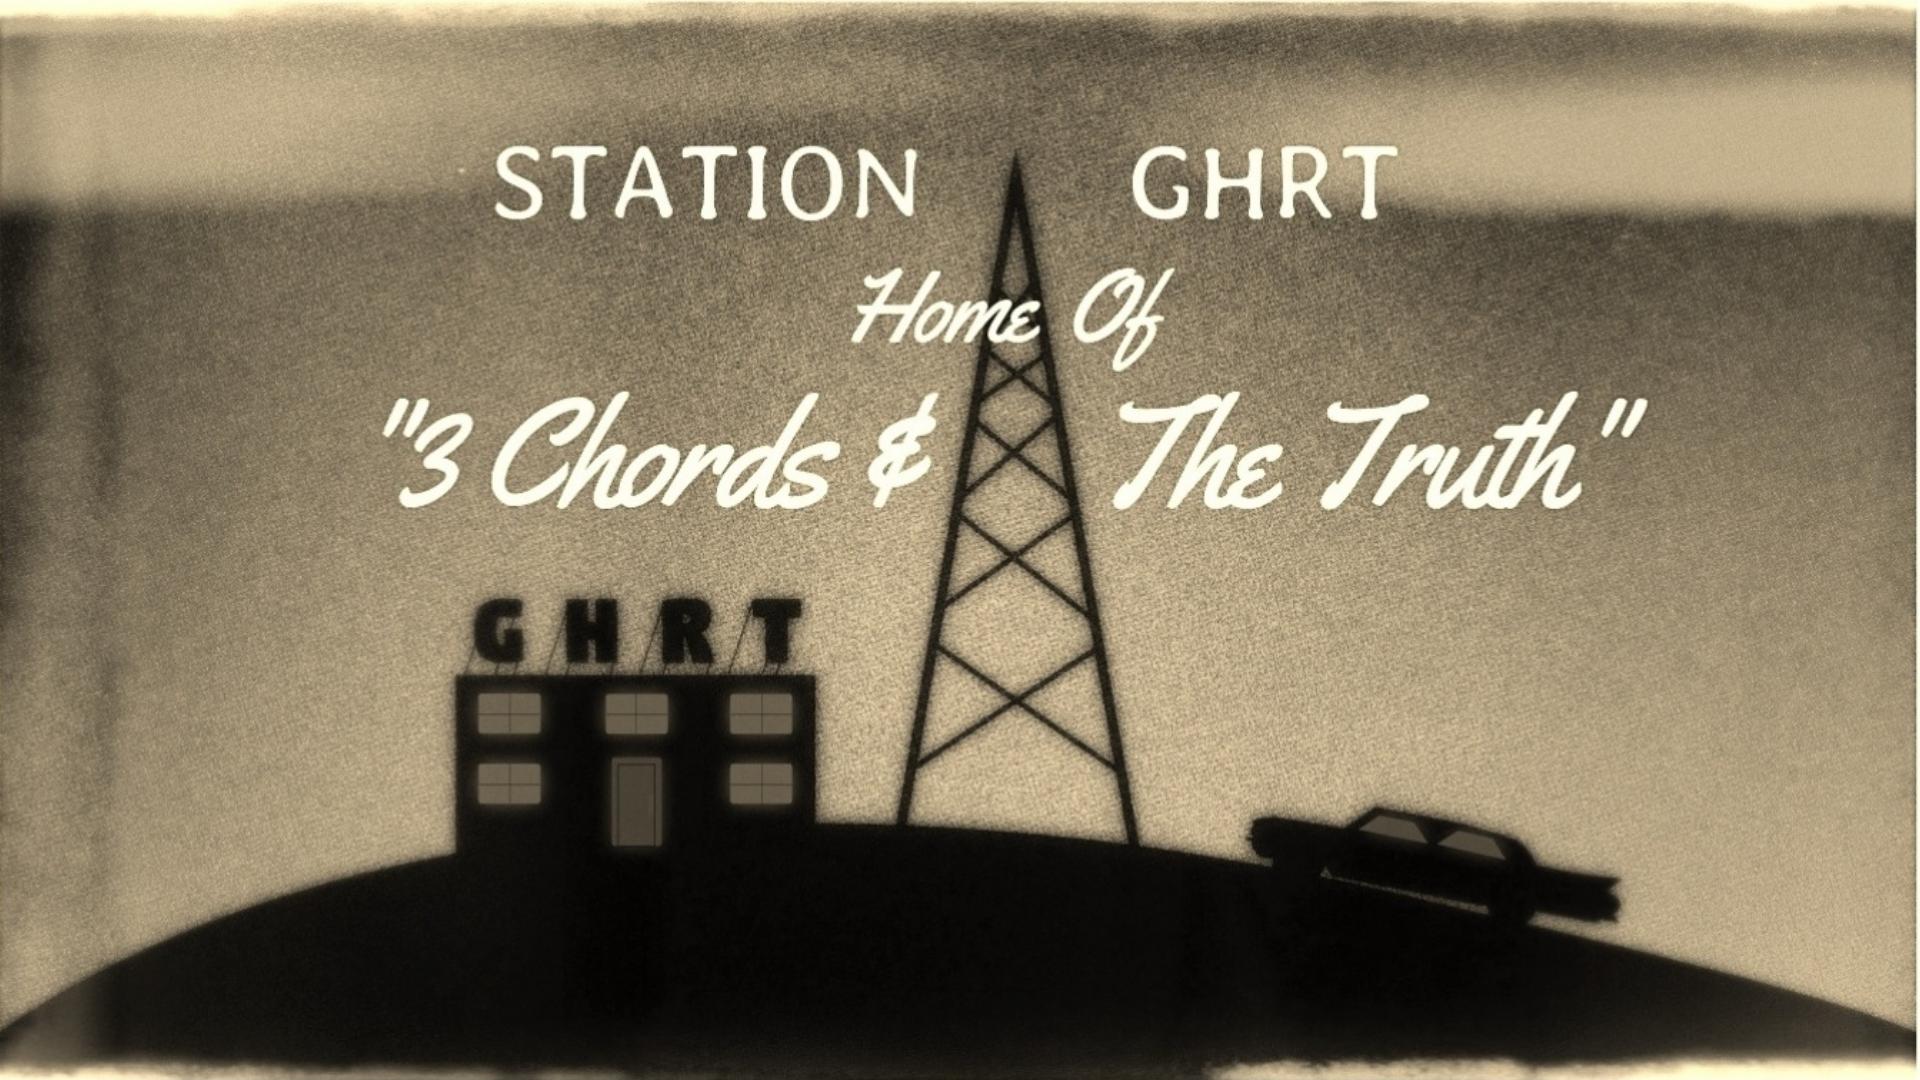 Station ghrt